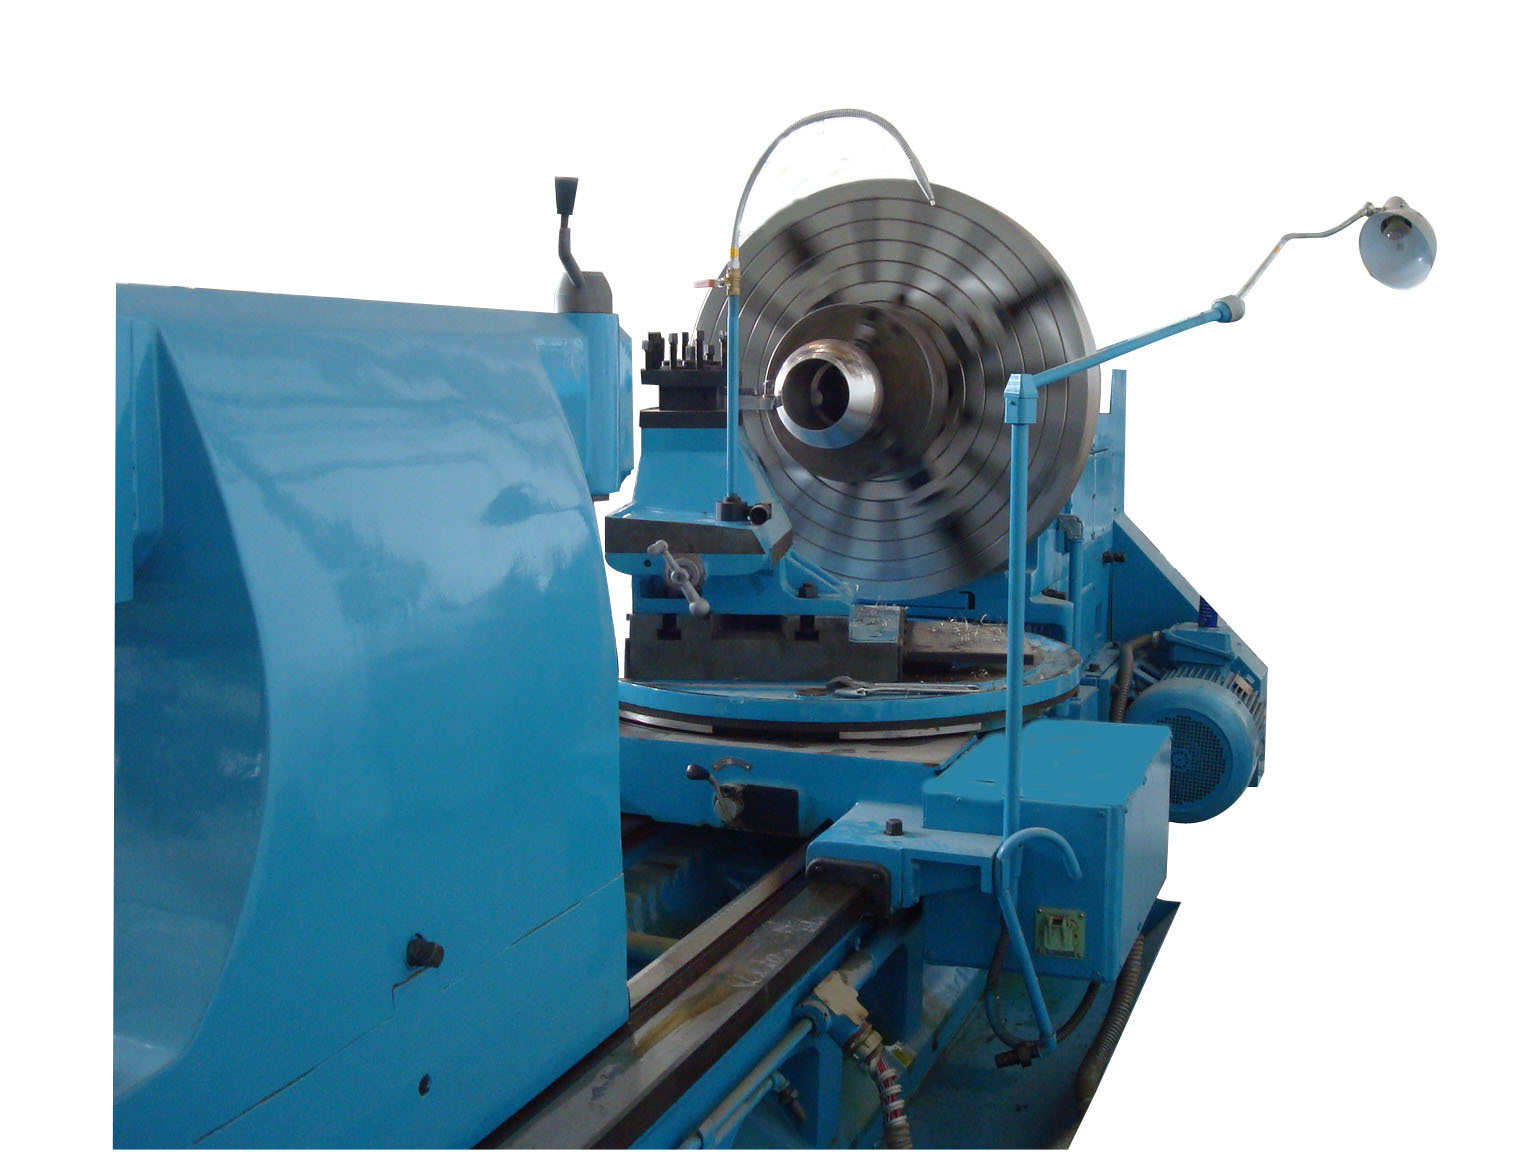 100mm Ball Cutter Spherical Lathe Machine